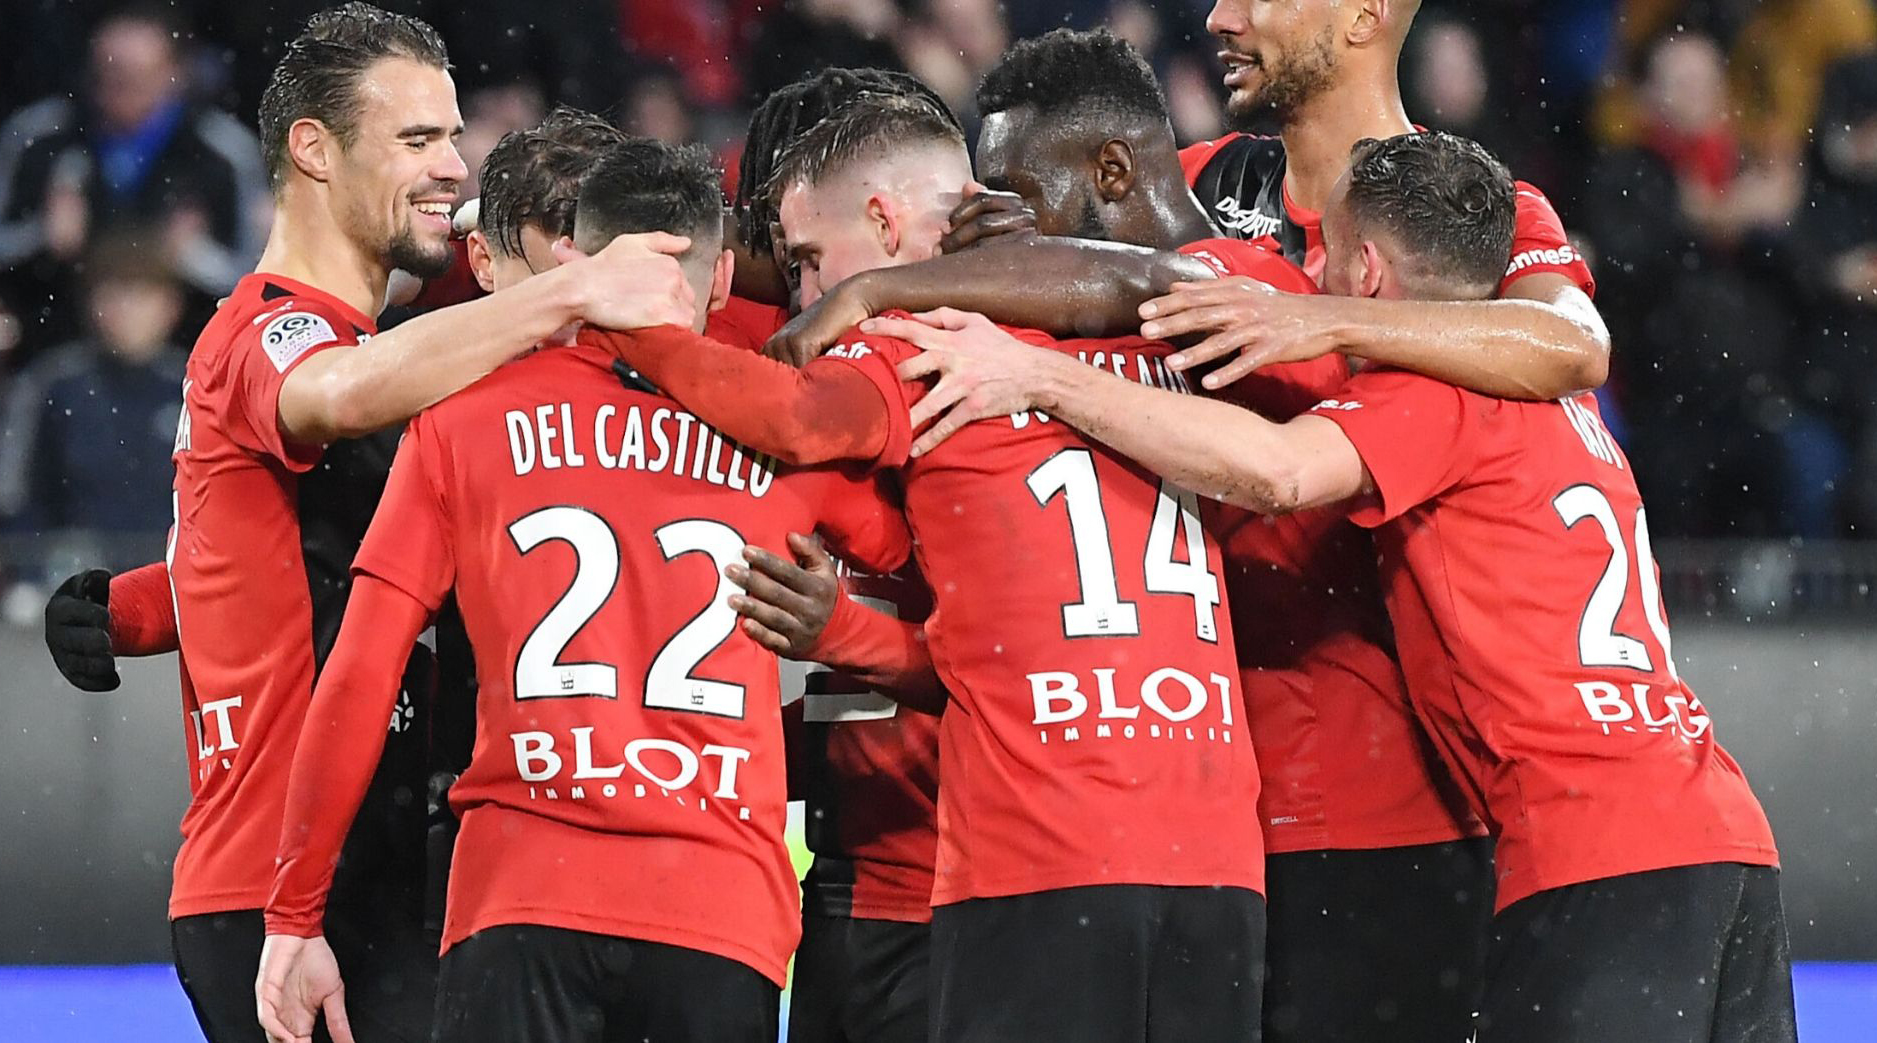 Nhan-dinh-Rennes-vs-Montpellier